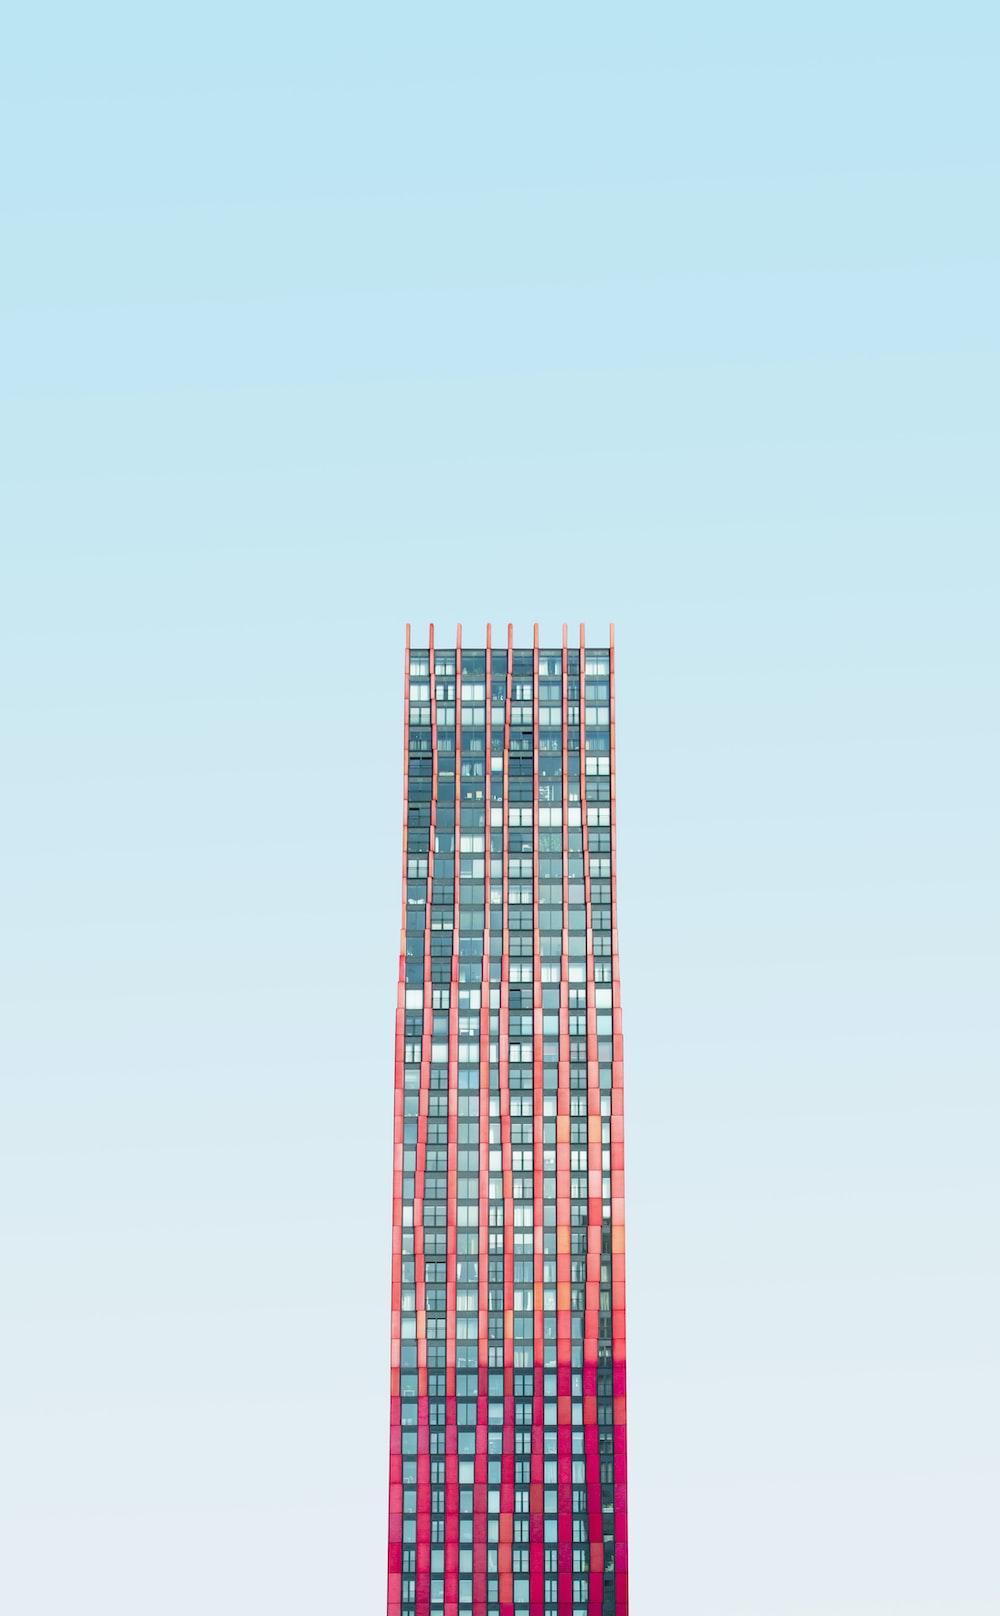 high-rise building under blue skies daytime